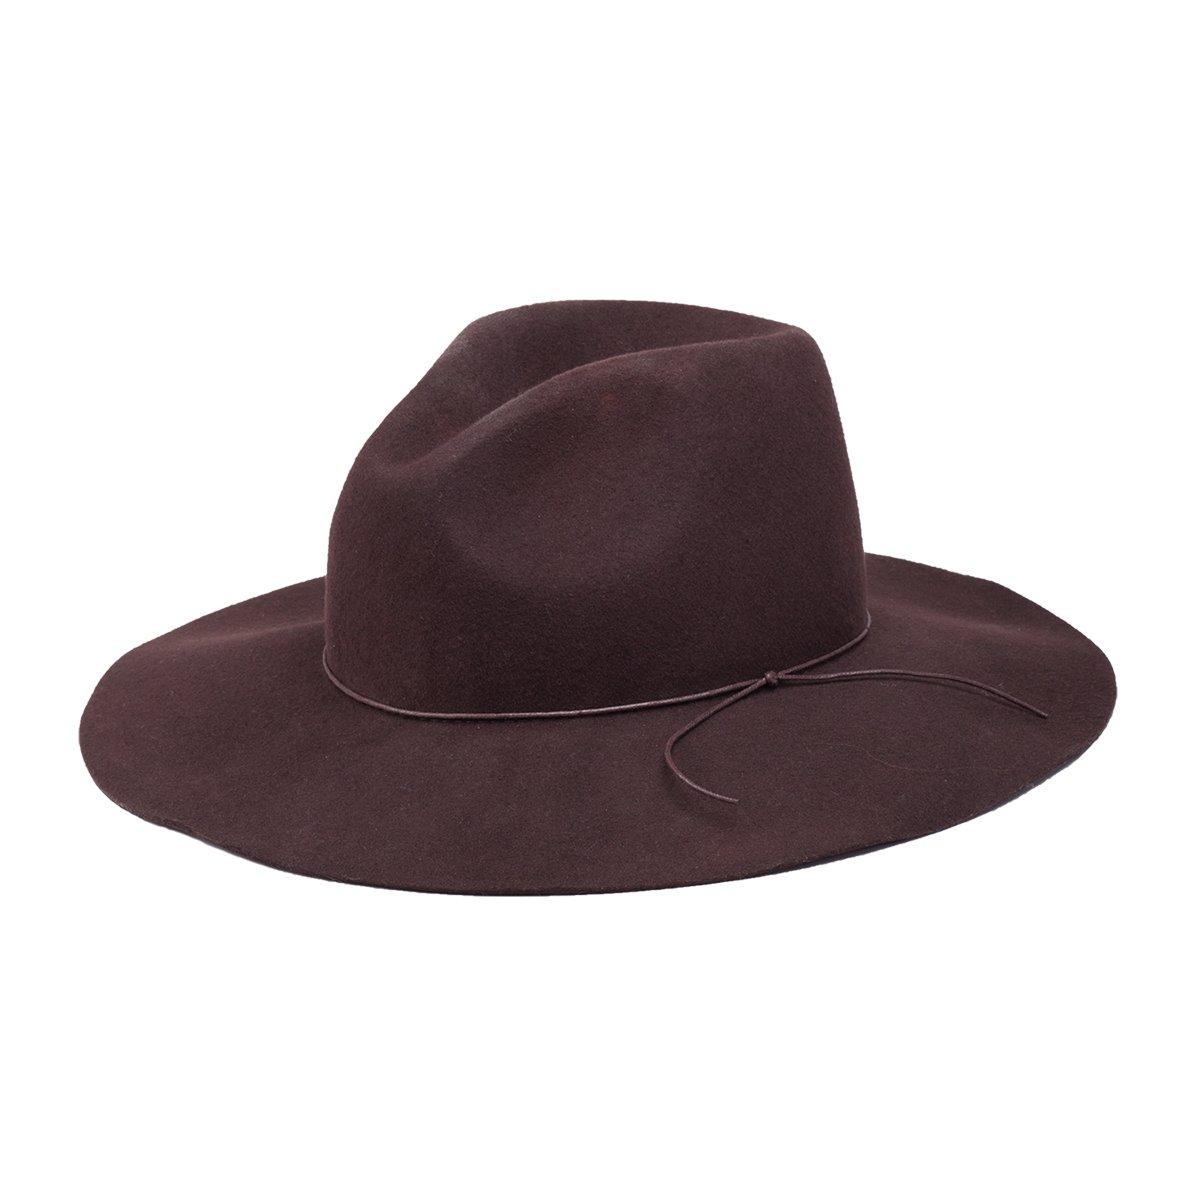 Peter Grimm Zima Wool Felt Sun Hat – Wide Brim Sable Fedora - Brown